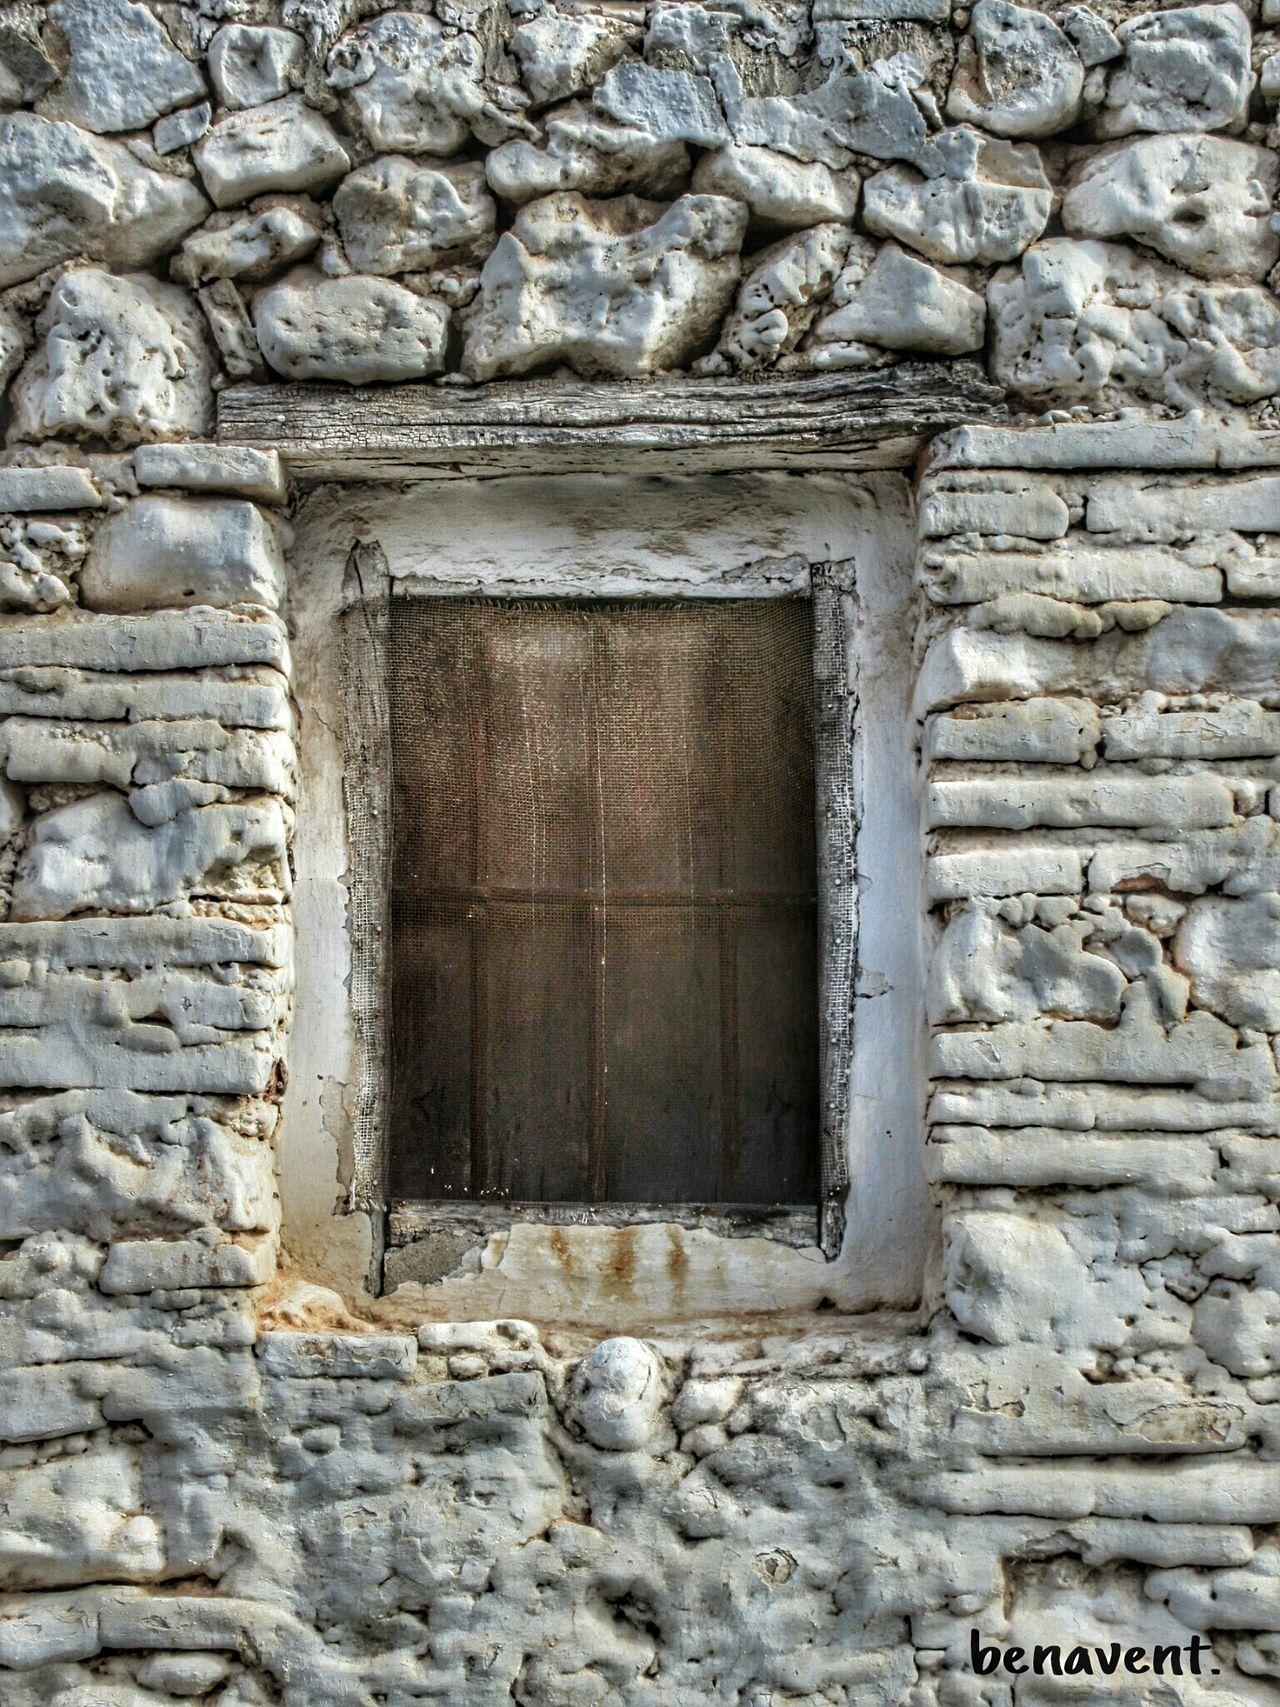 Finestra Finestres Ventanas Window Casa Abandonada Abandoned Places Abandoned Buildings País De L'olivera Callejeando Passejant